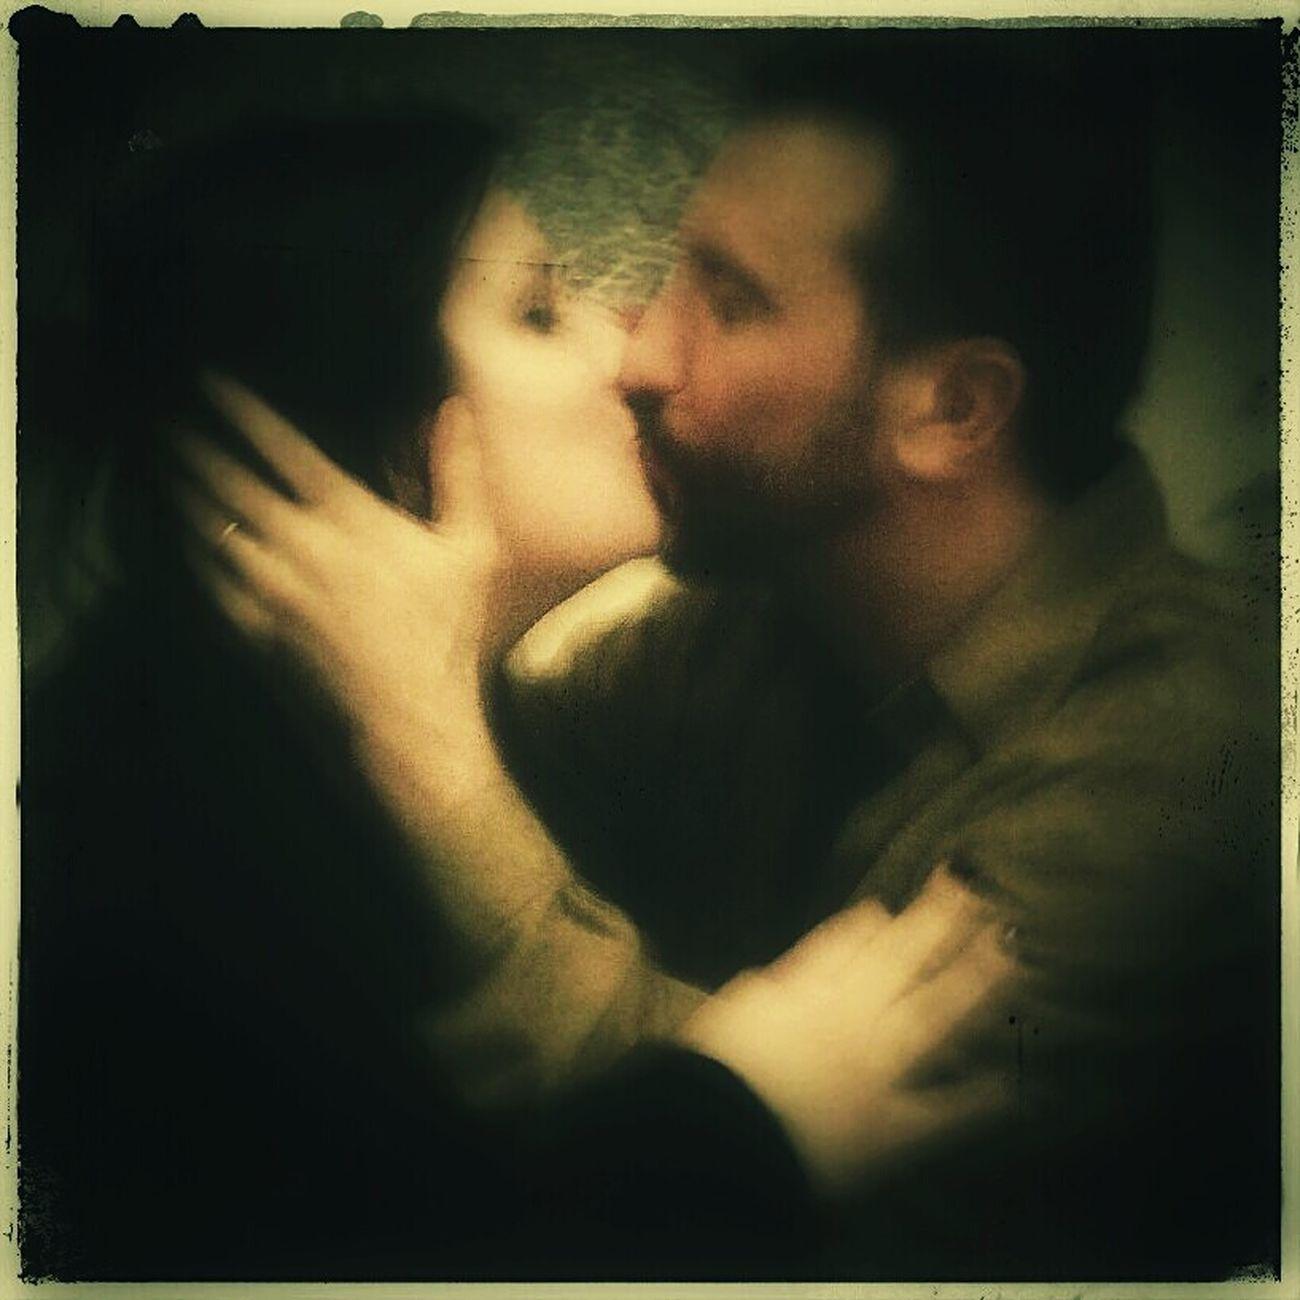 Amore Love Amour Amor Lief Lieben Amar Aşk Kochać Dragoste Liefde